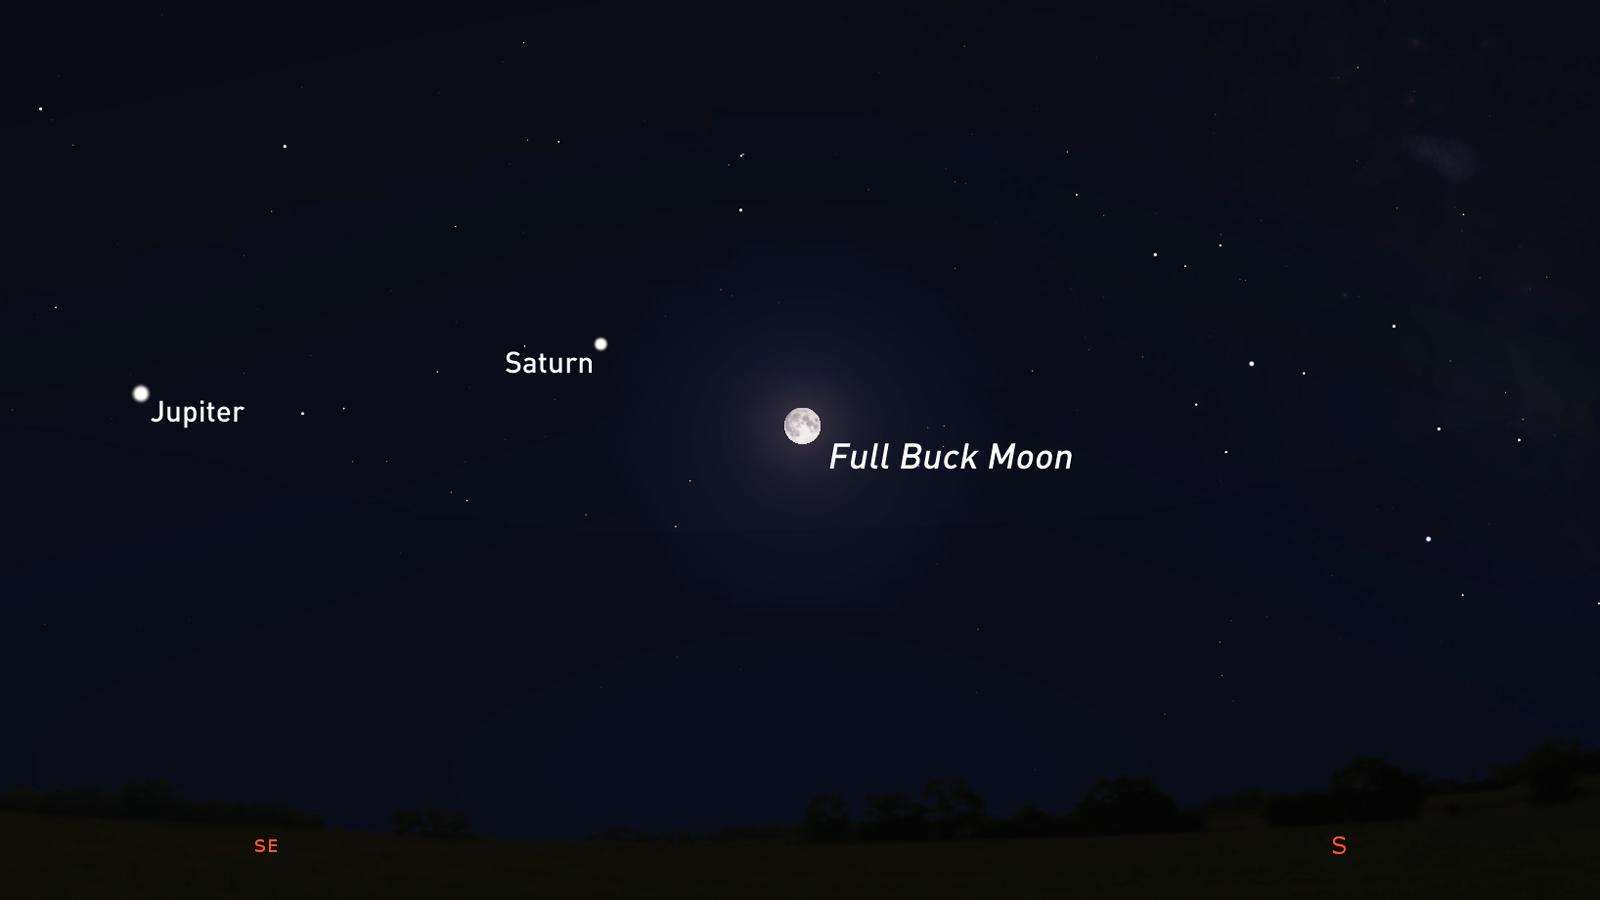 Full Buck Moon 2021